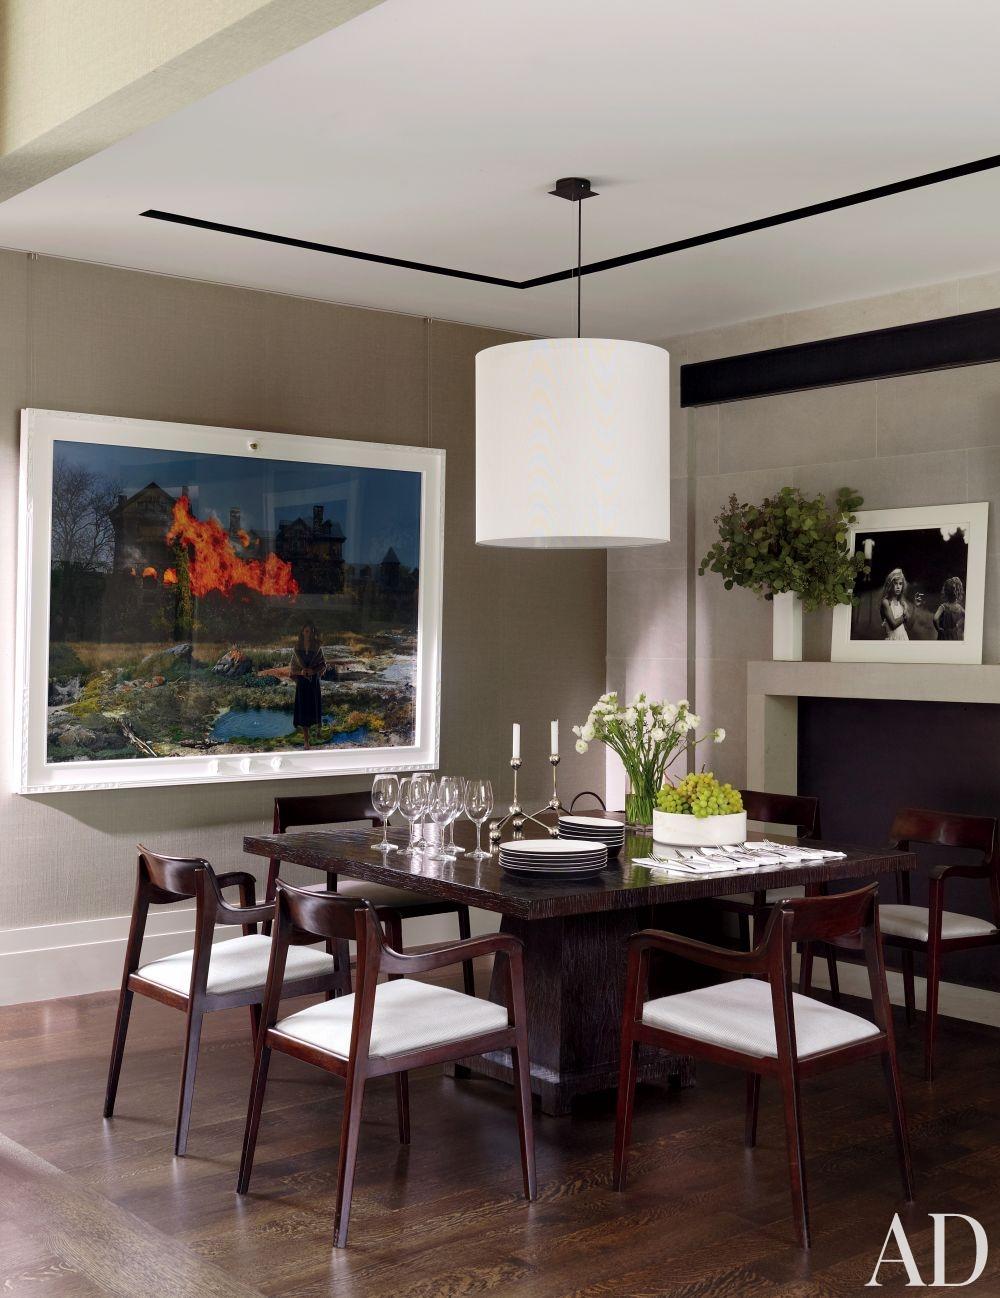 Interiors a contemporary southern renovation sukio for Interior digest